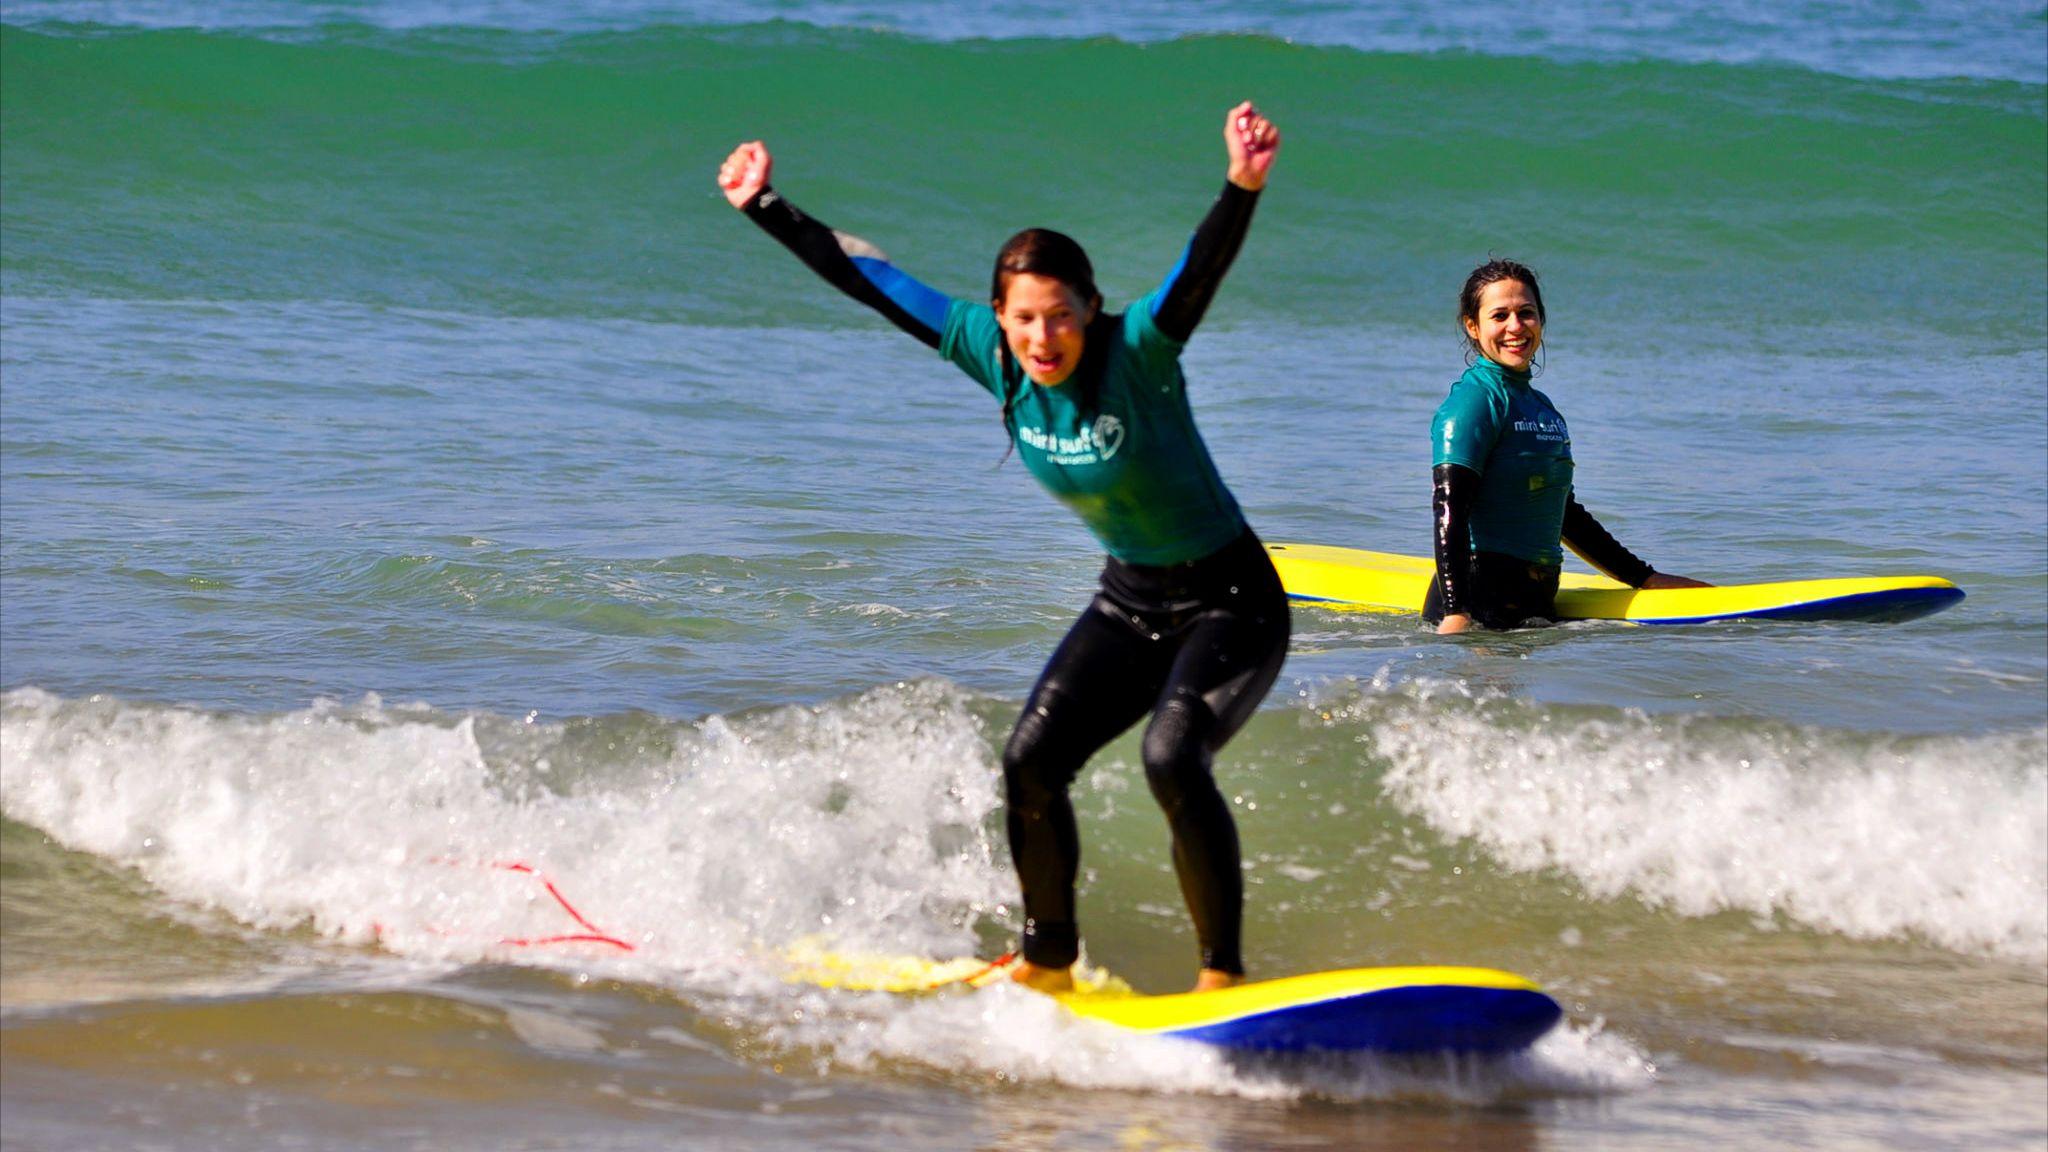 Triumphant woman catching a wave in Agadir